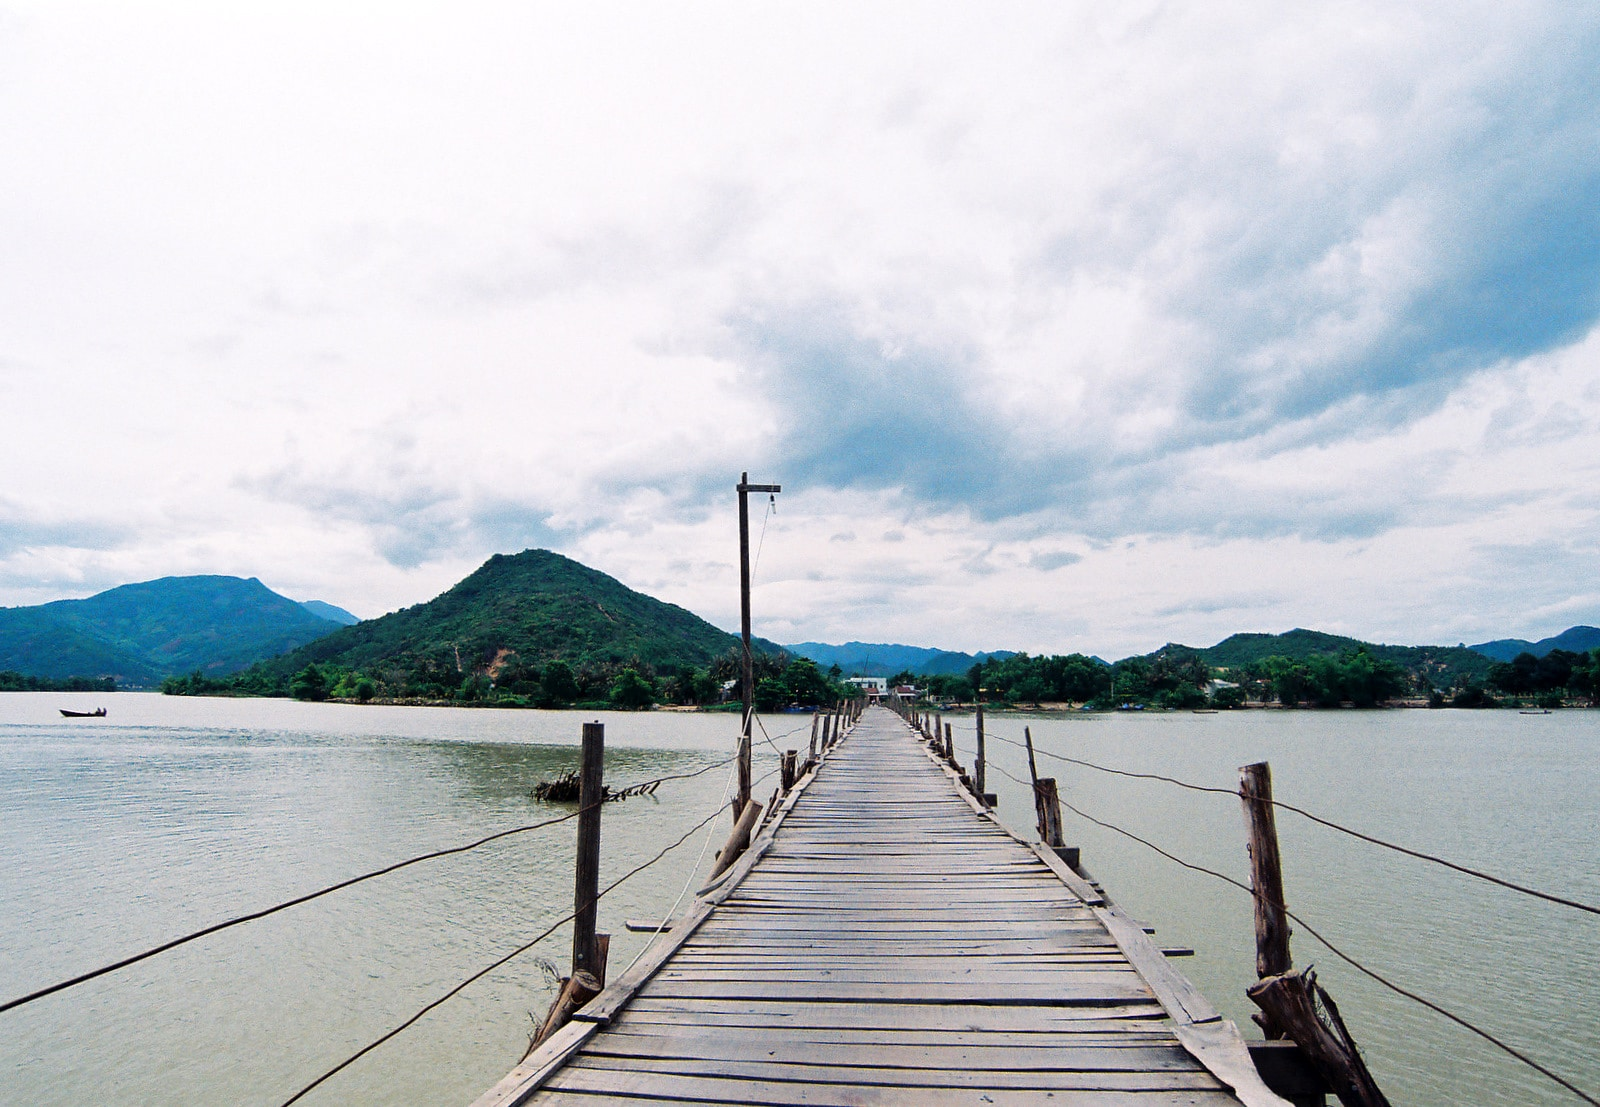 Image of a bridge in Khanh Hoa, Vietnam